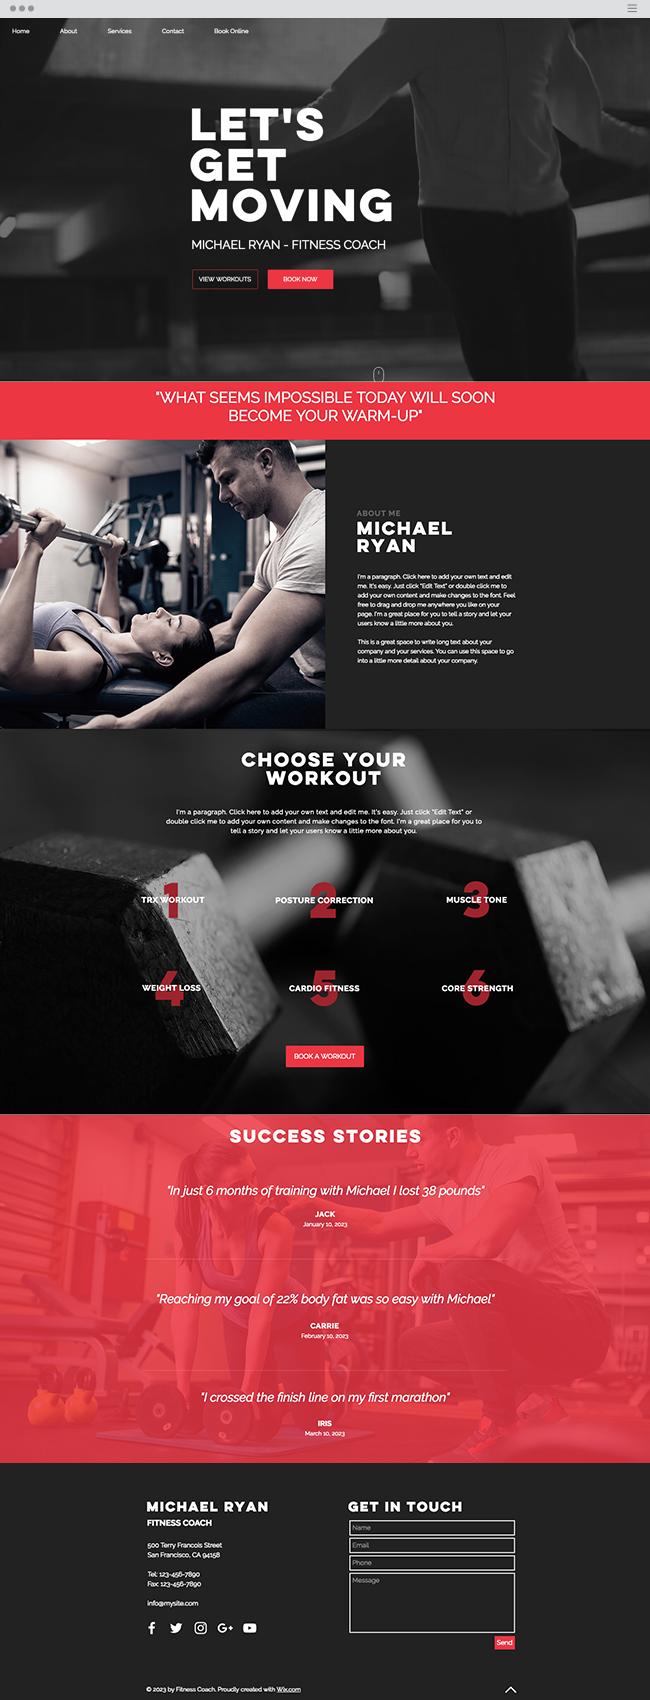 Fitness Coach Website Template Fitness Coach Website